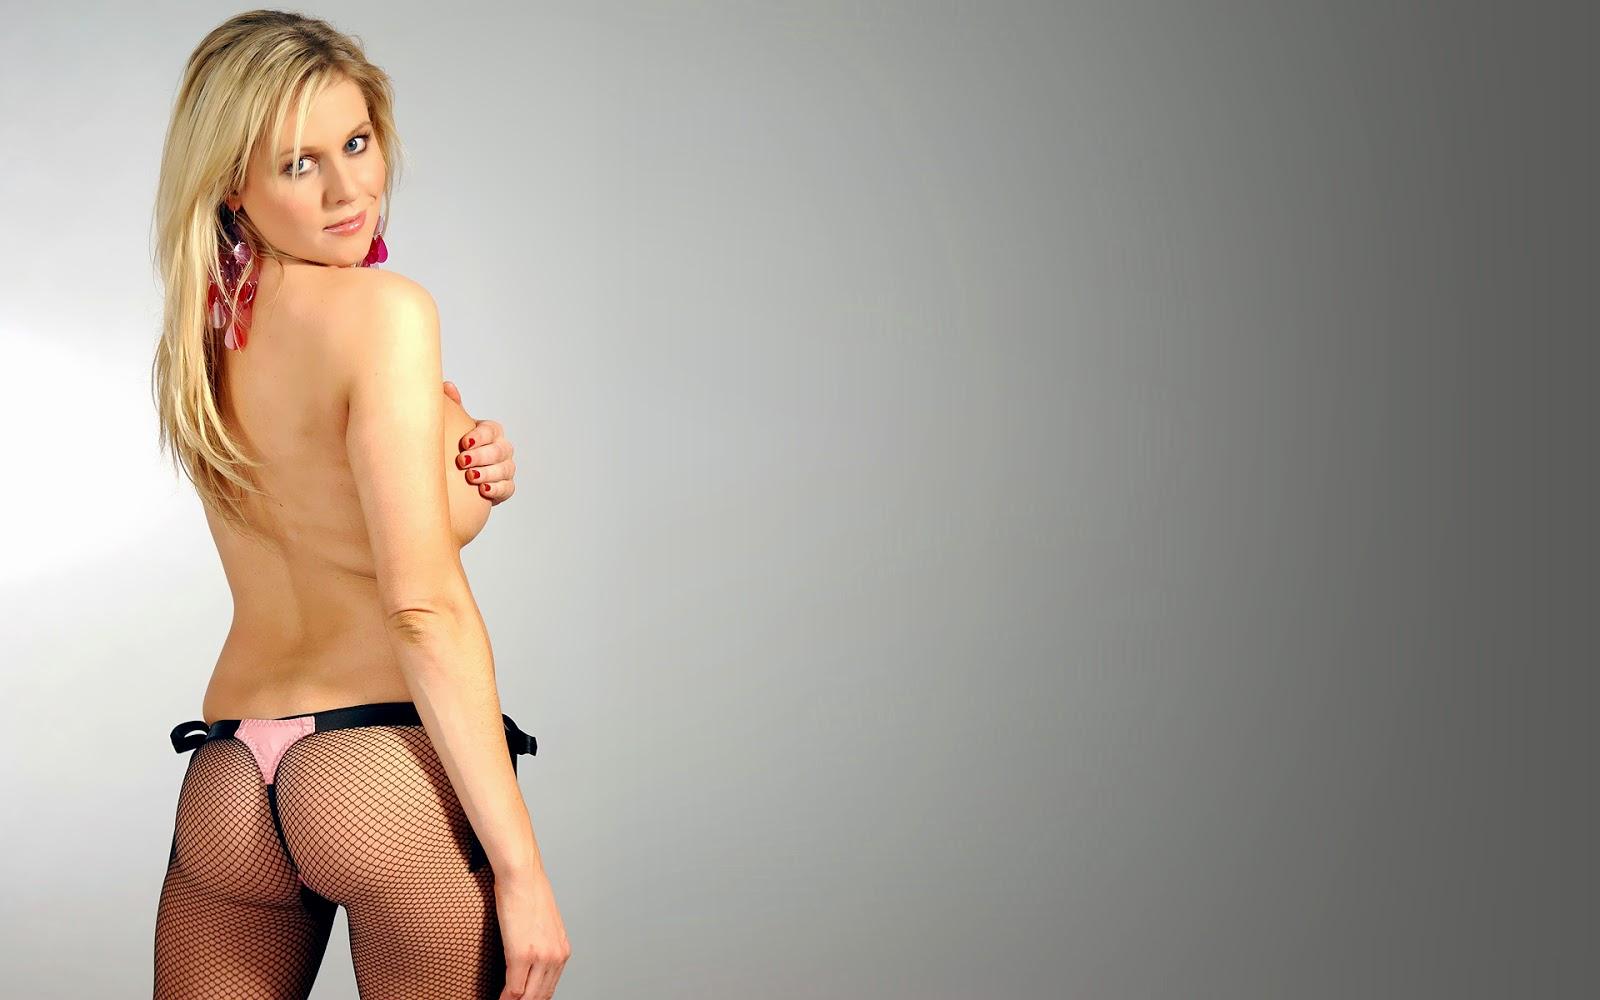 African nudist beach sex videos